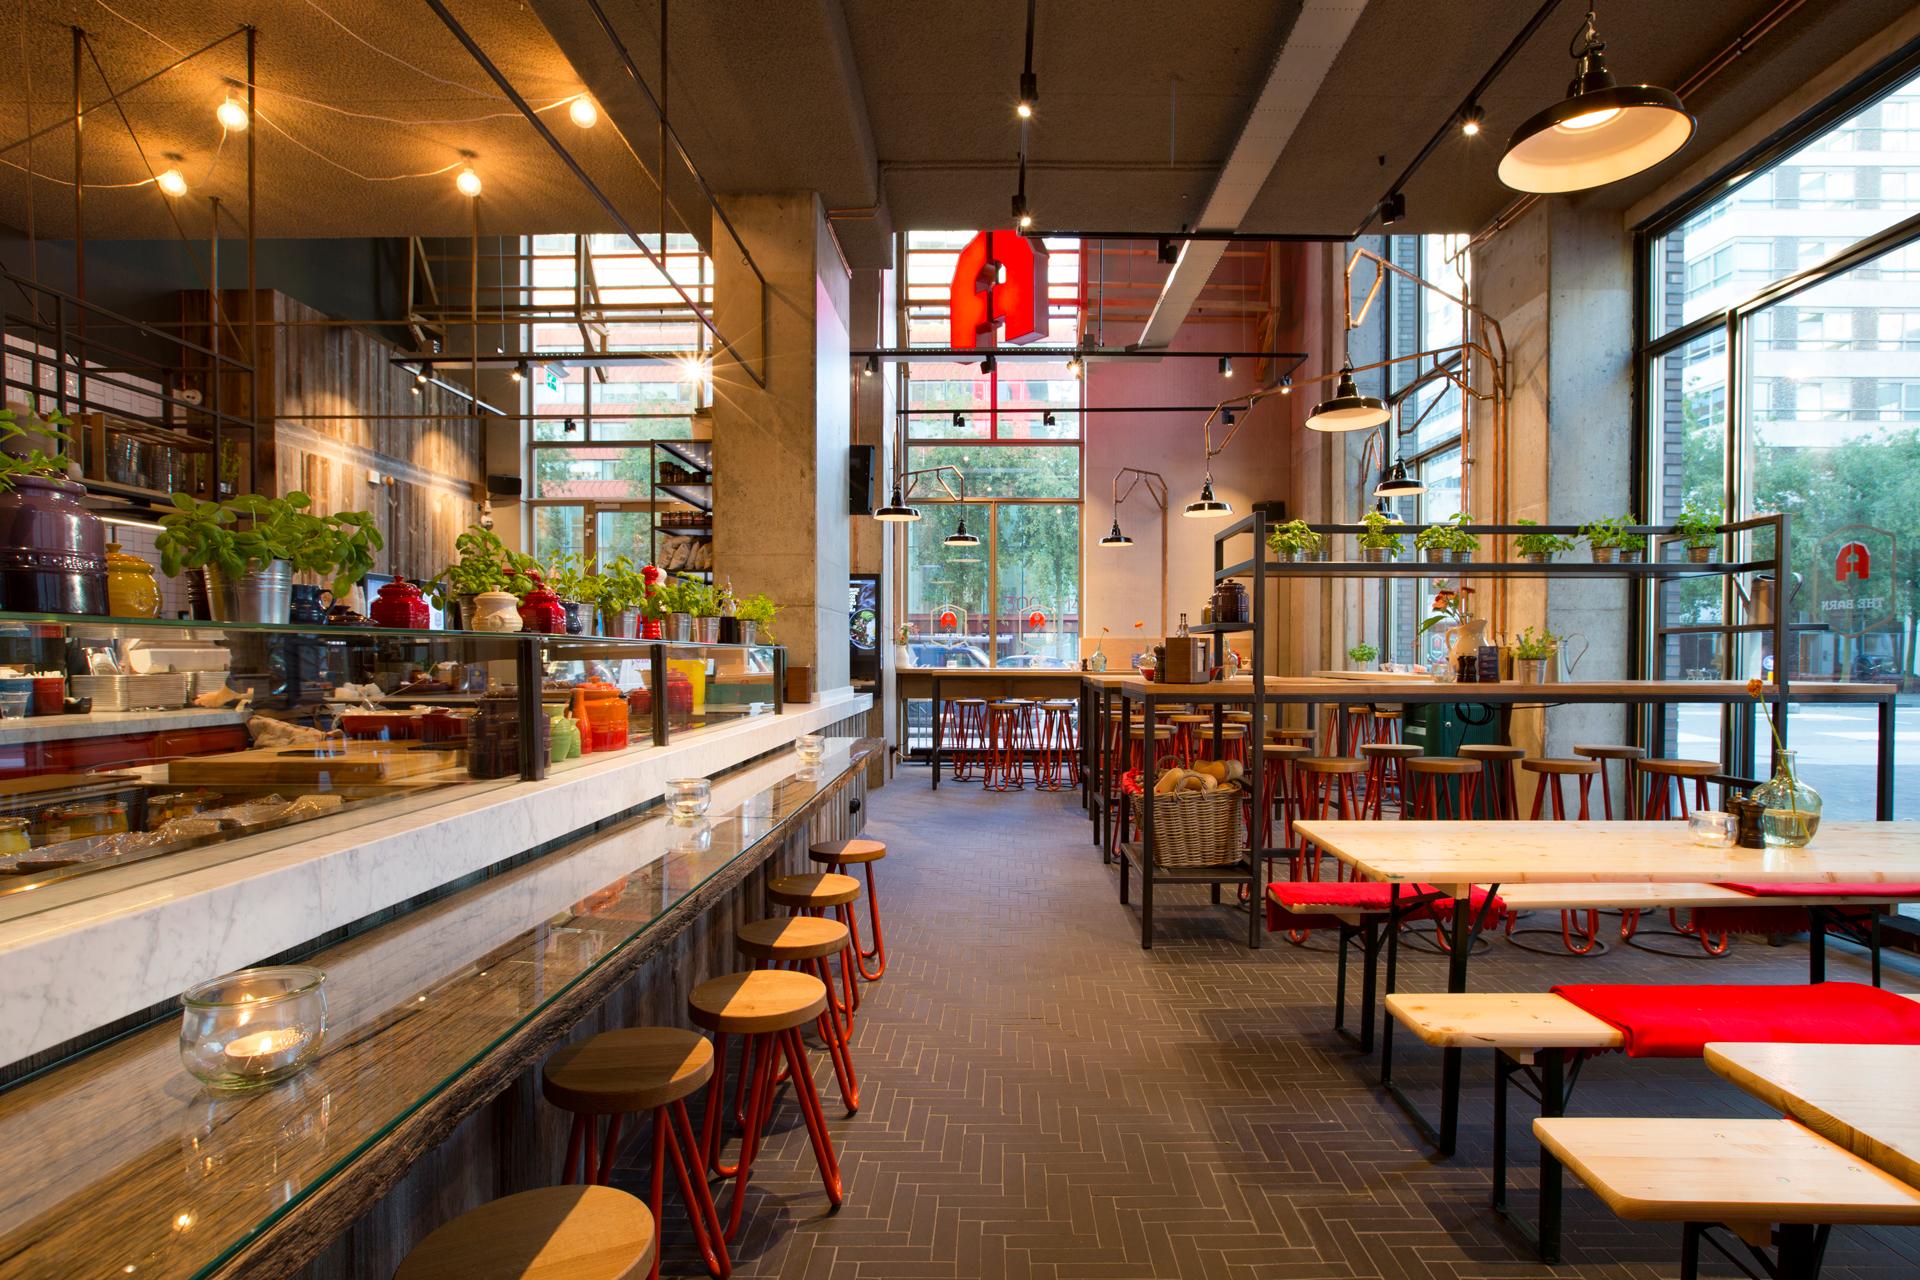 Take-away Amsterdam Concept Store - Suzanne Holtz Studio